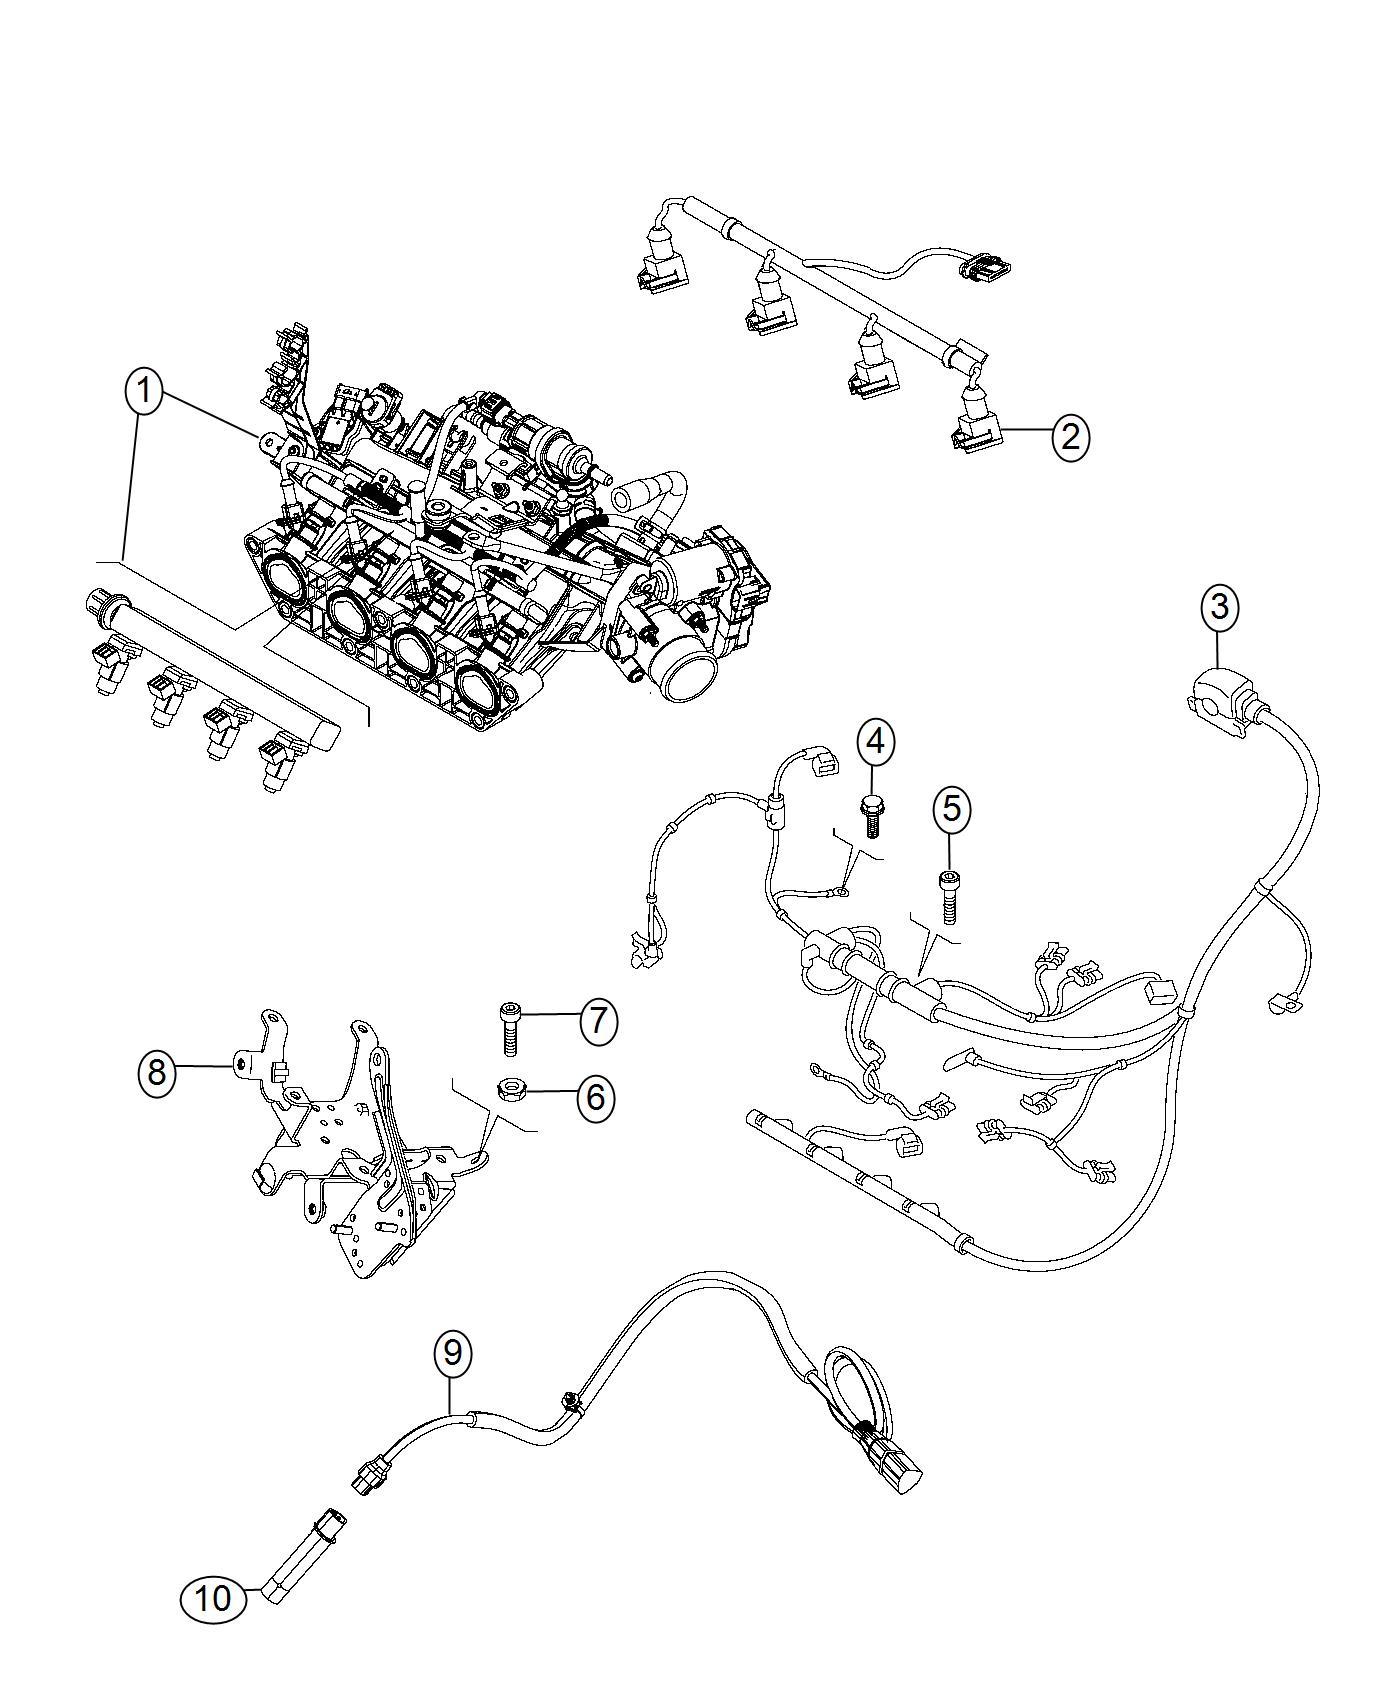 Jeep Renegade Heater Engine Block Canada Cylinder Nhk Turbocharged